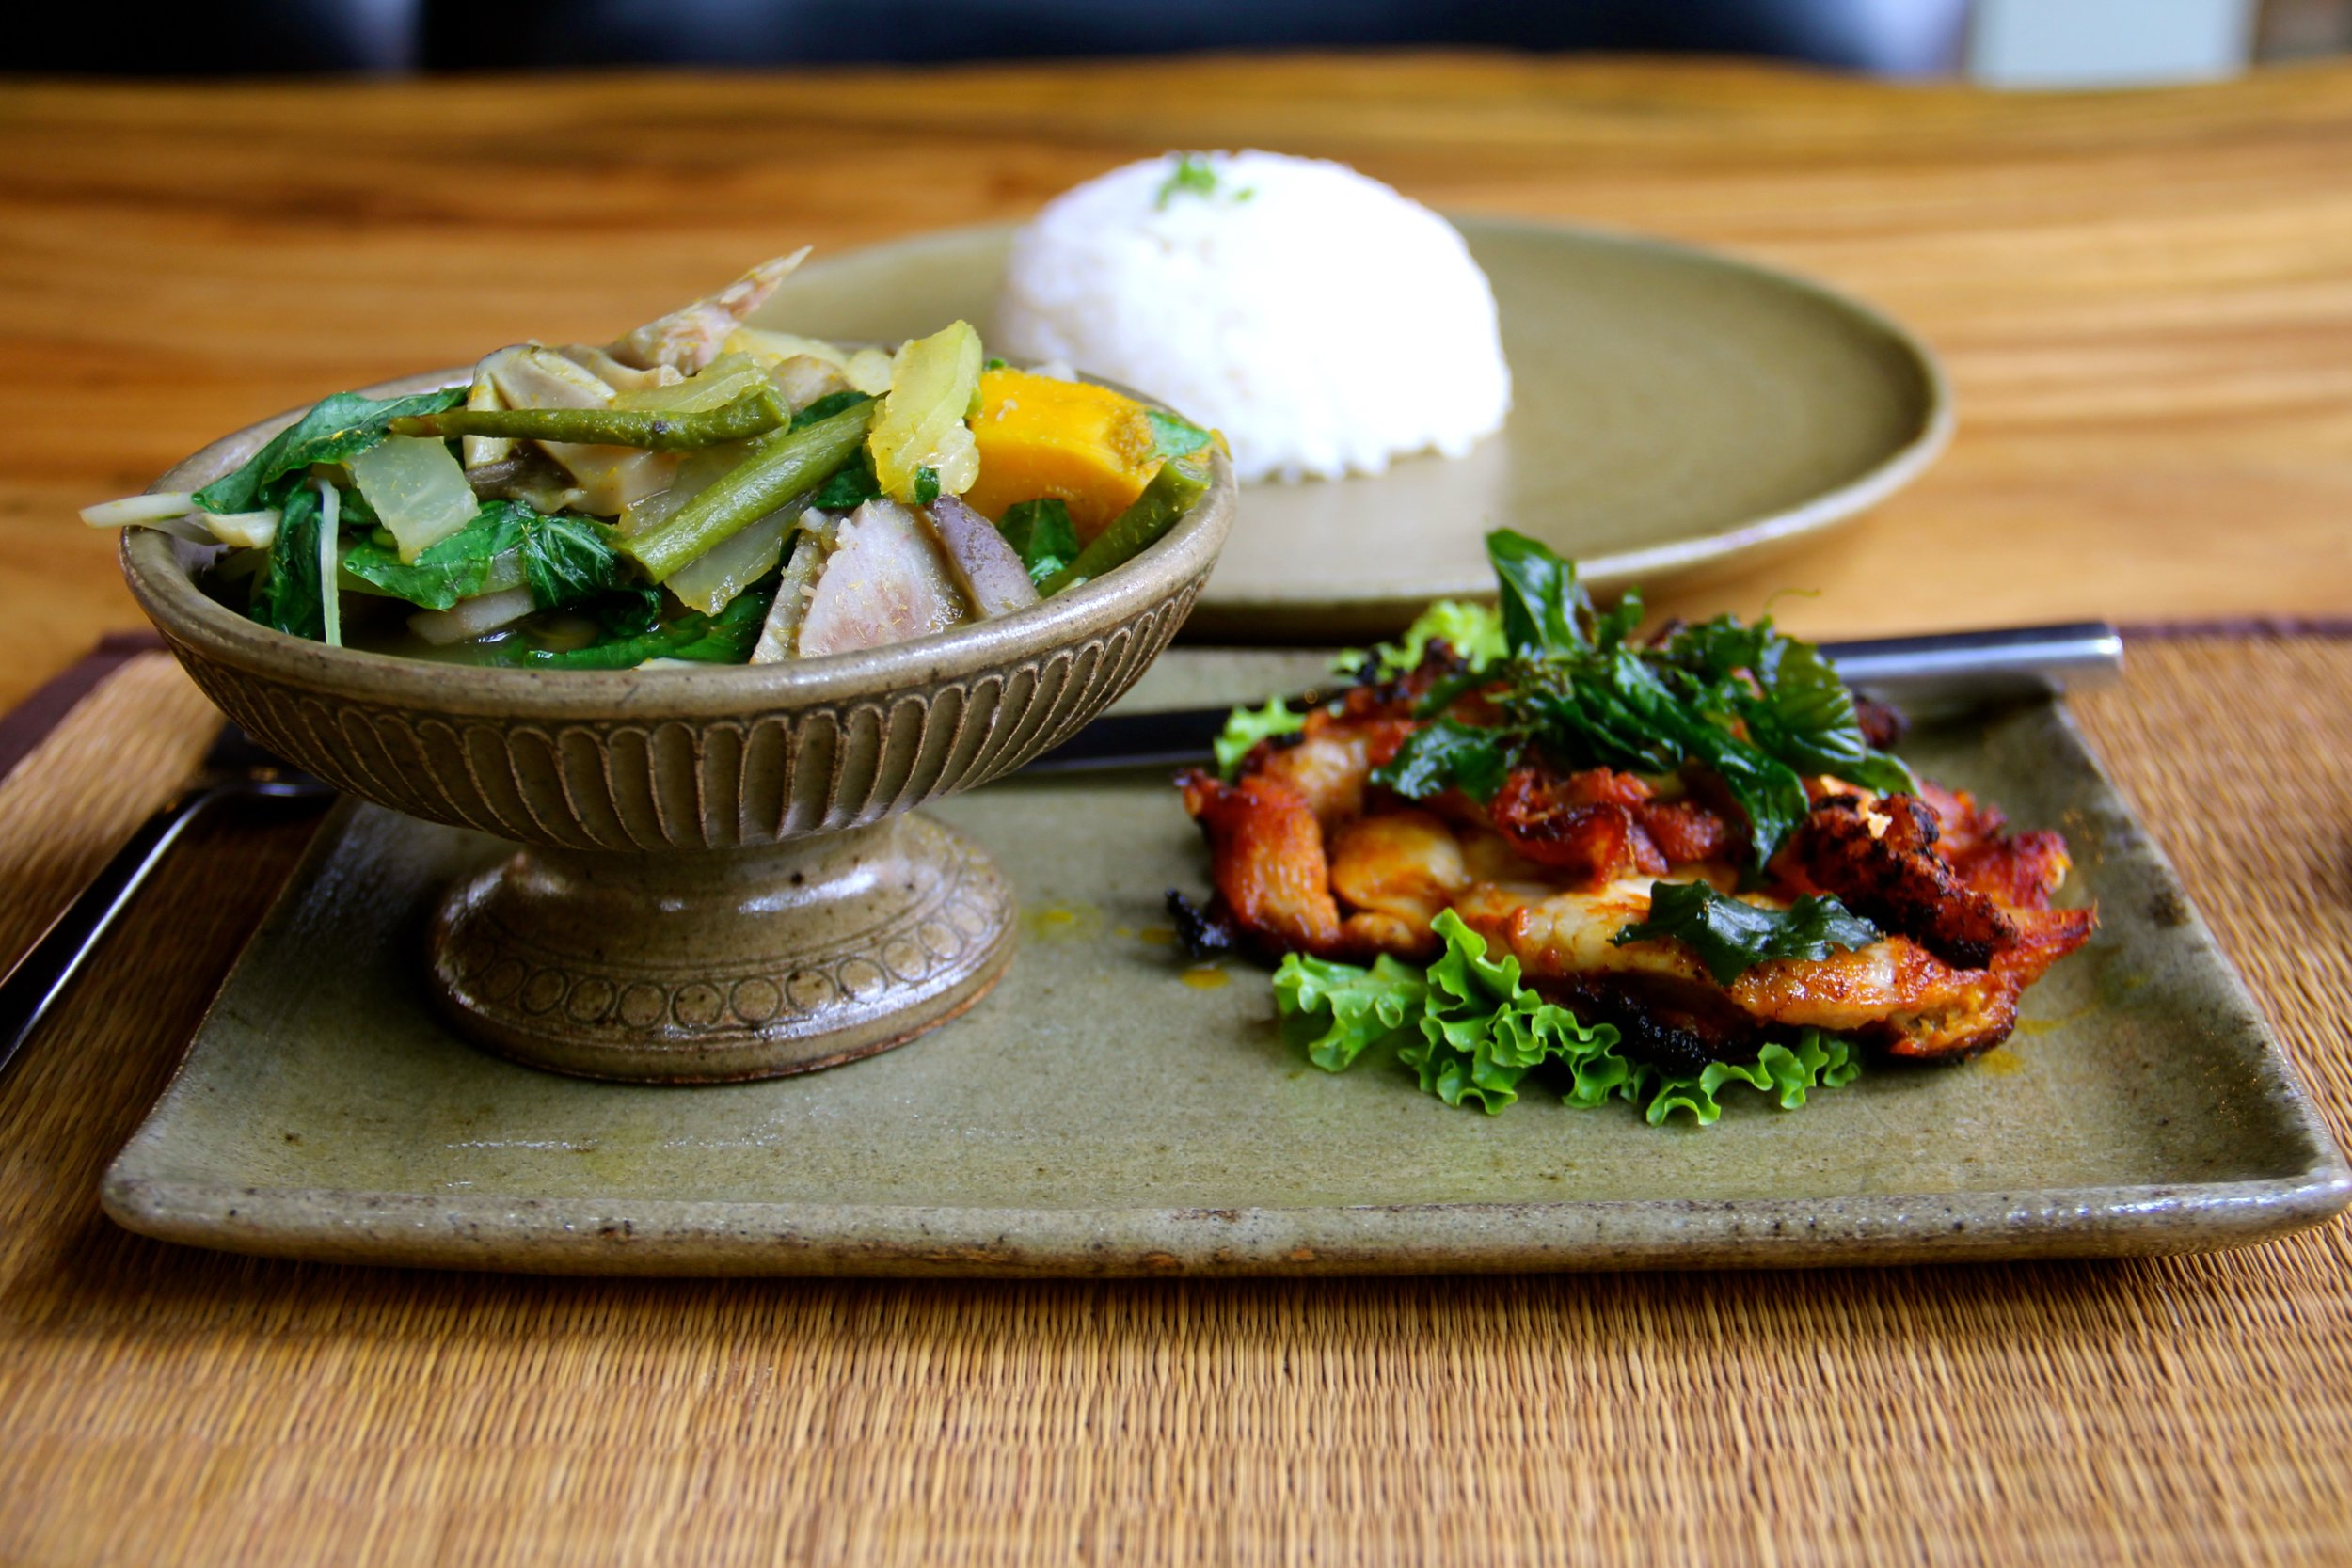 Roast Chicken, Rohatt Cafe, Siem Reap, Cambodia